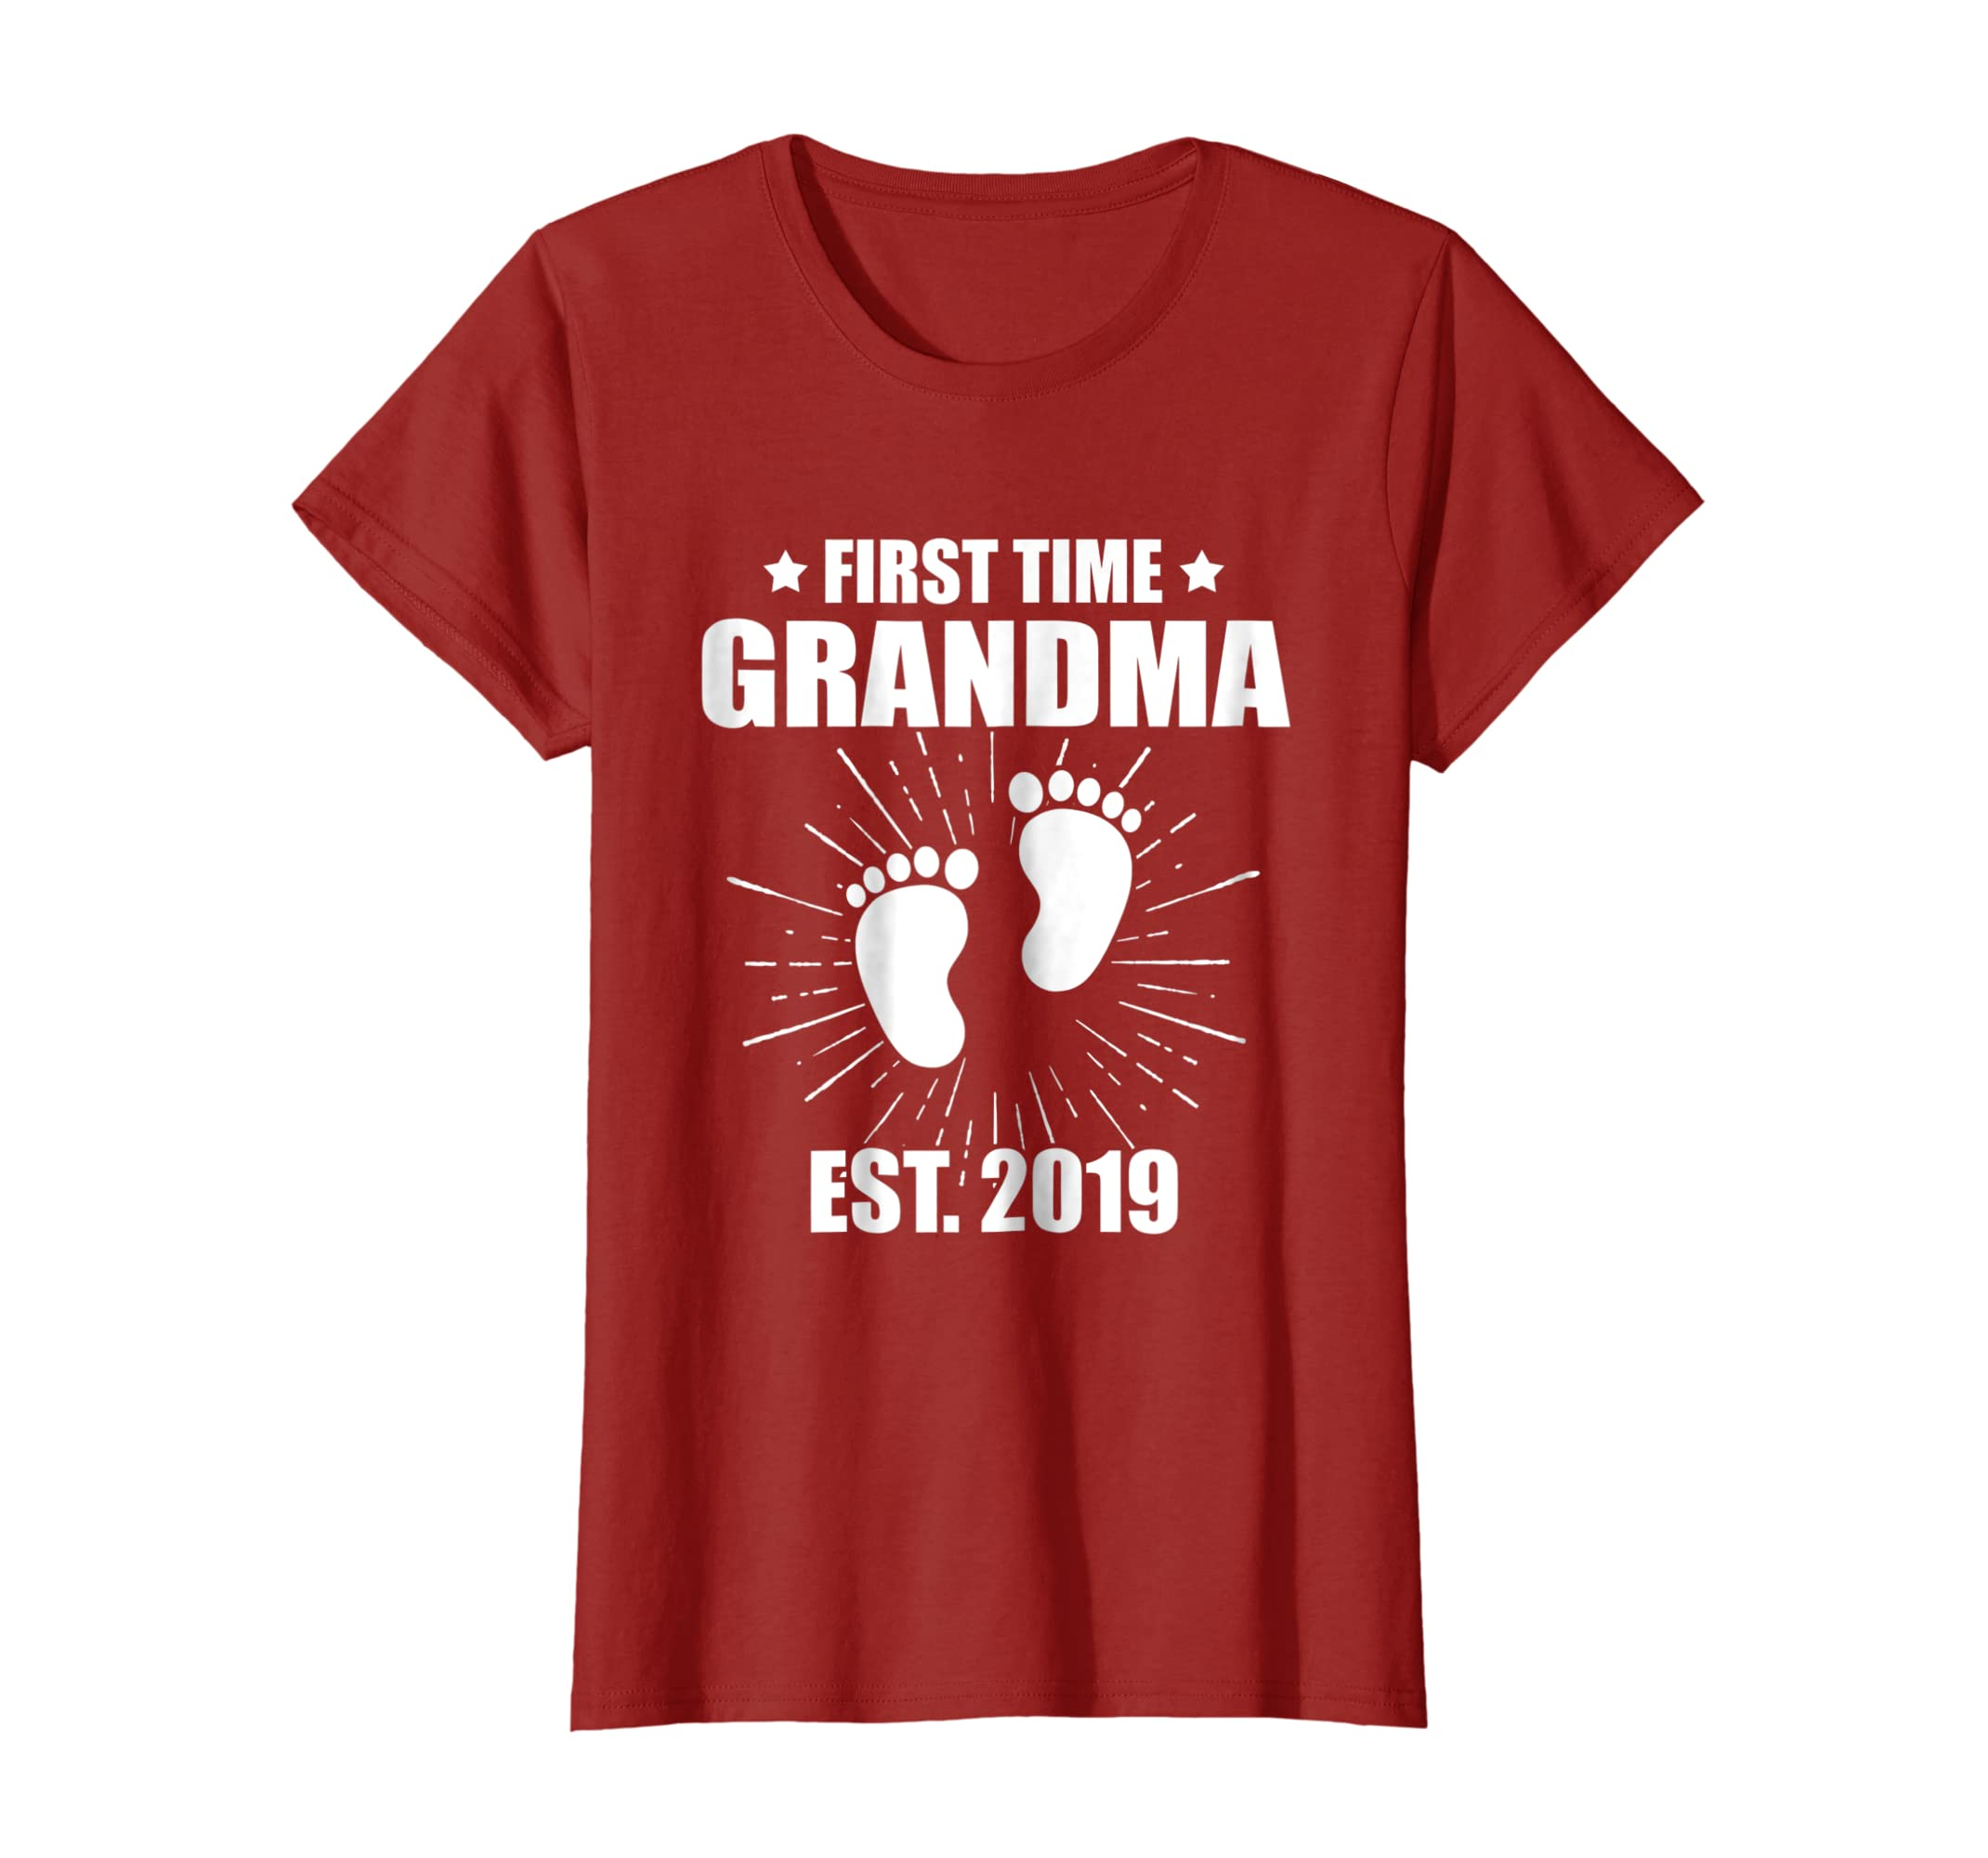 First Time Grandma EST 2019 on Grandparents day t shirt-Awarplus